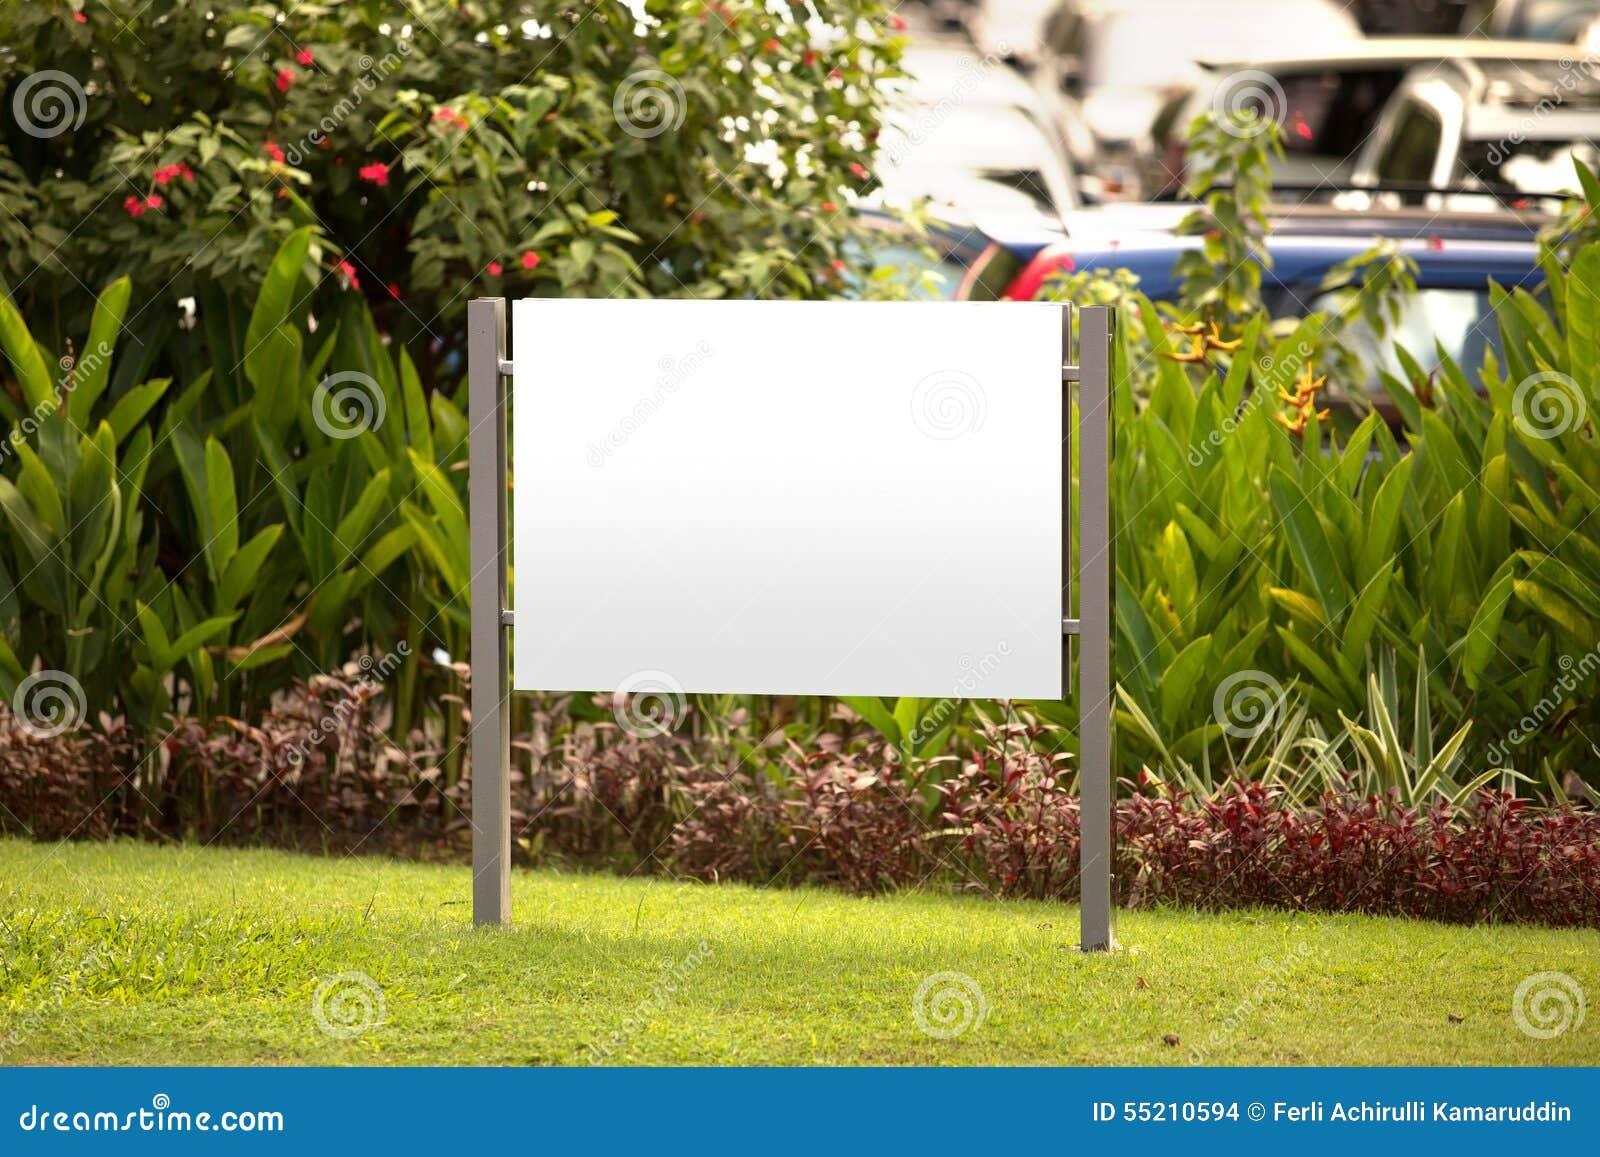 Blank billboard, for advertisement